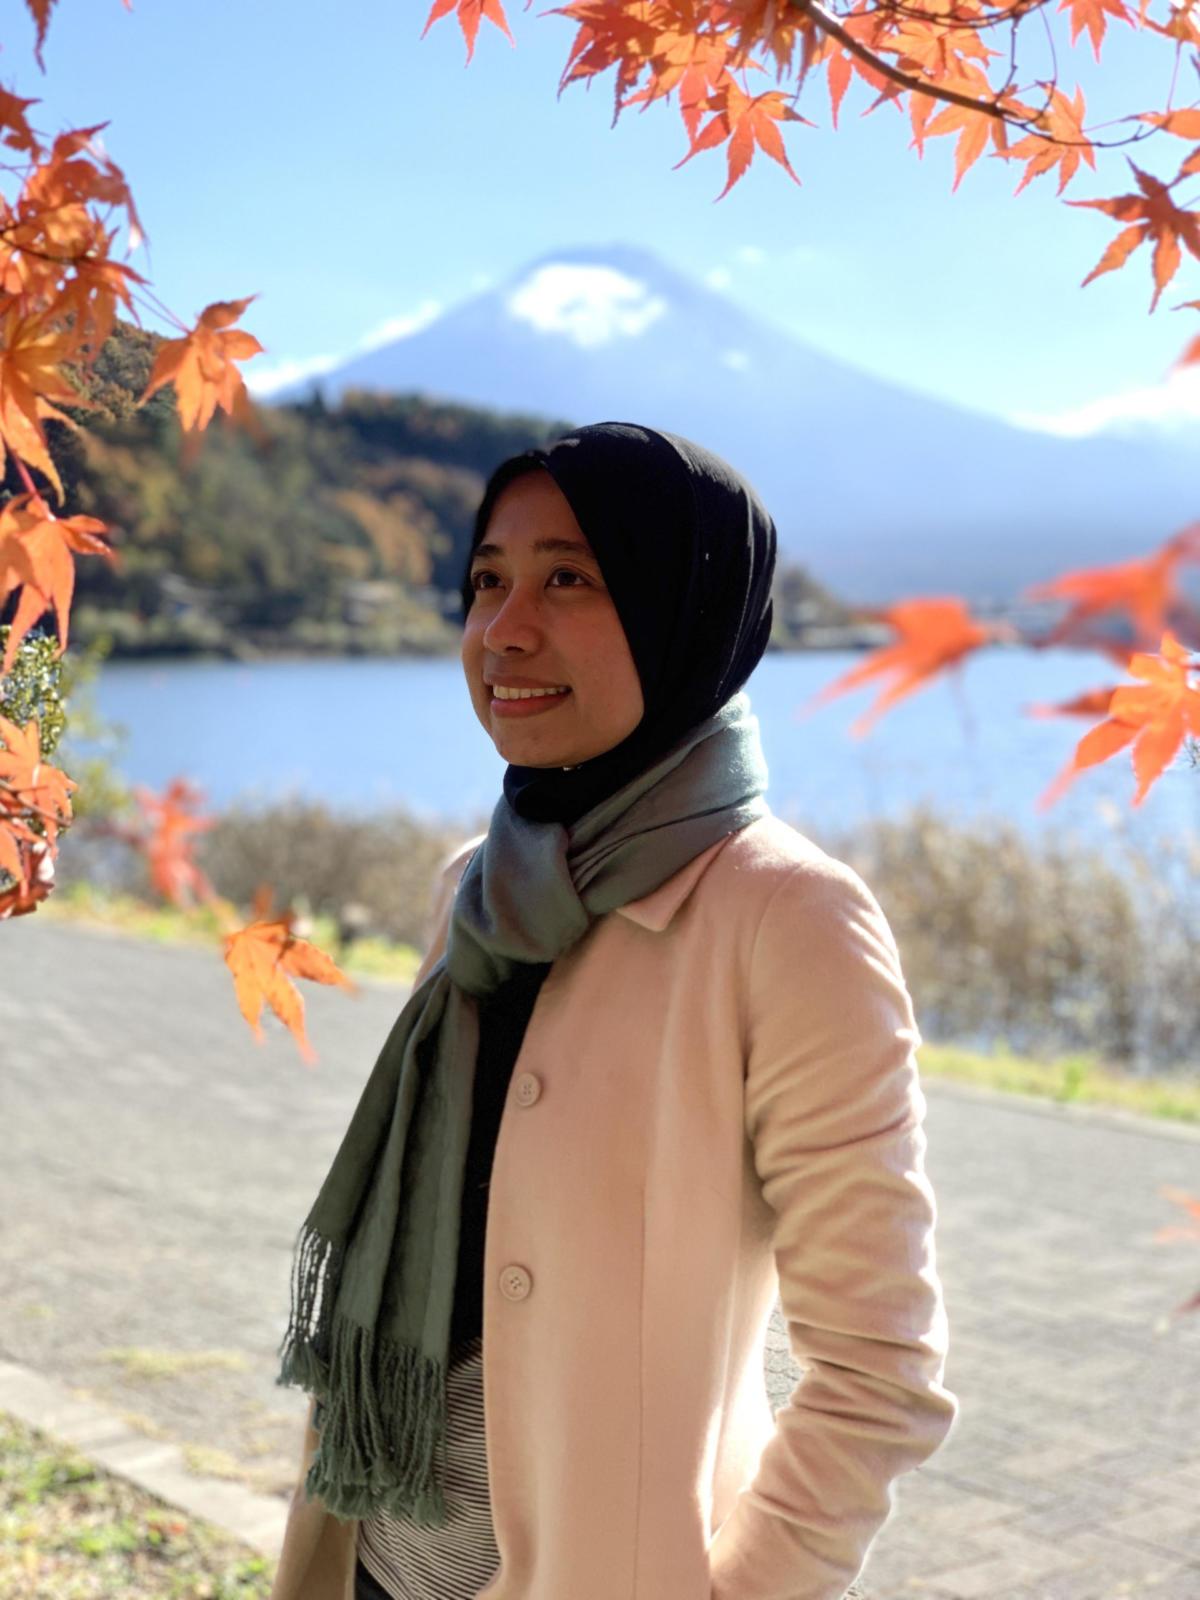 8. Fuji